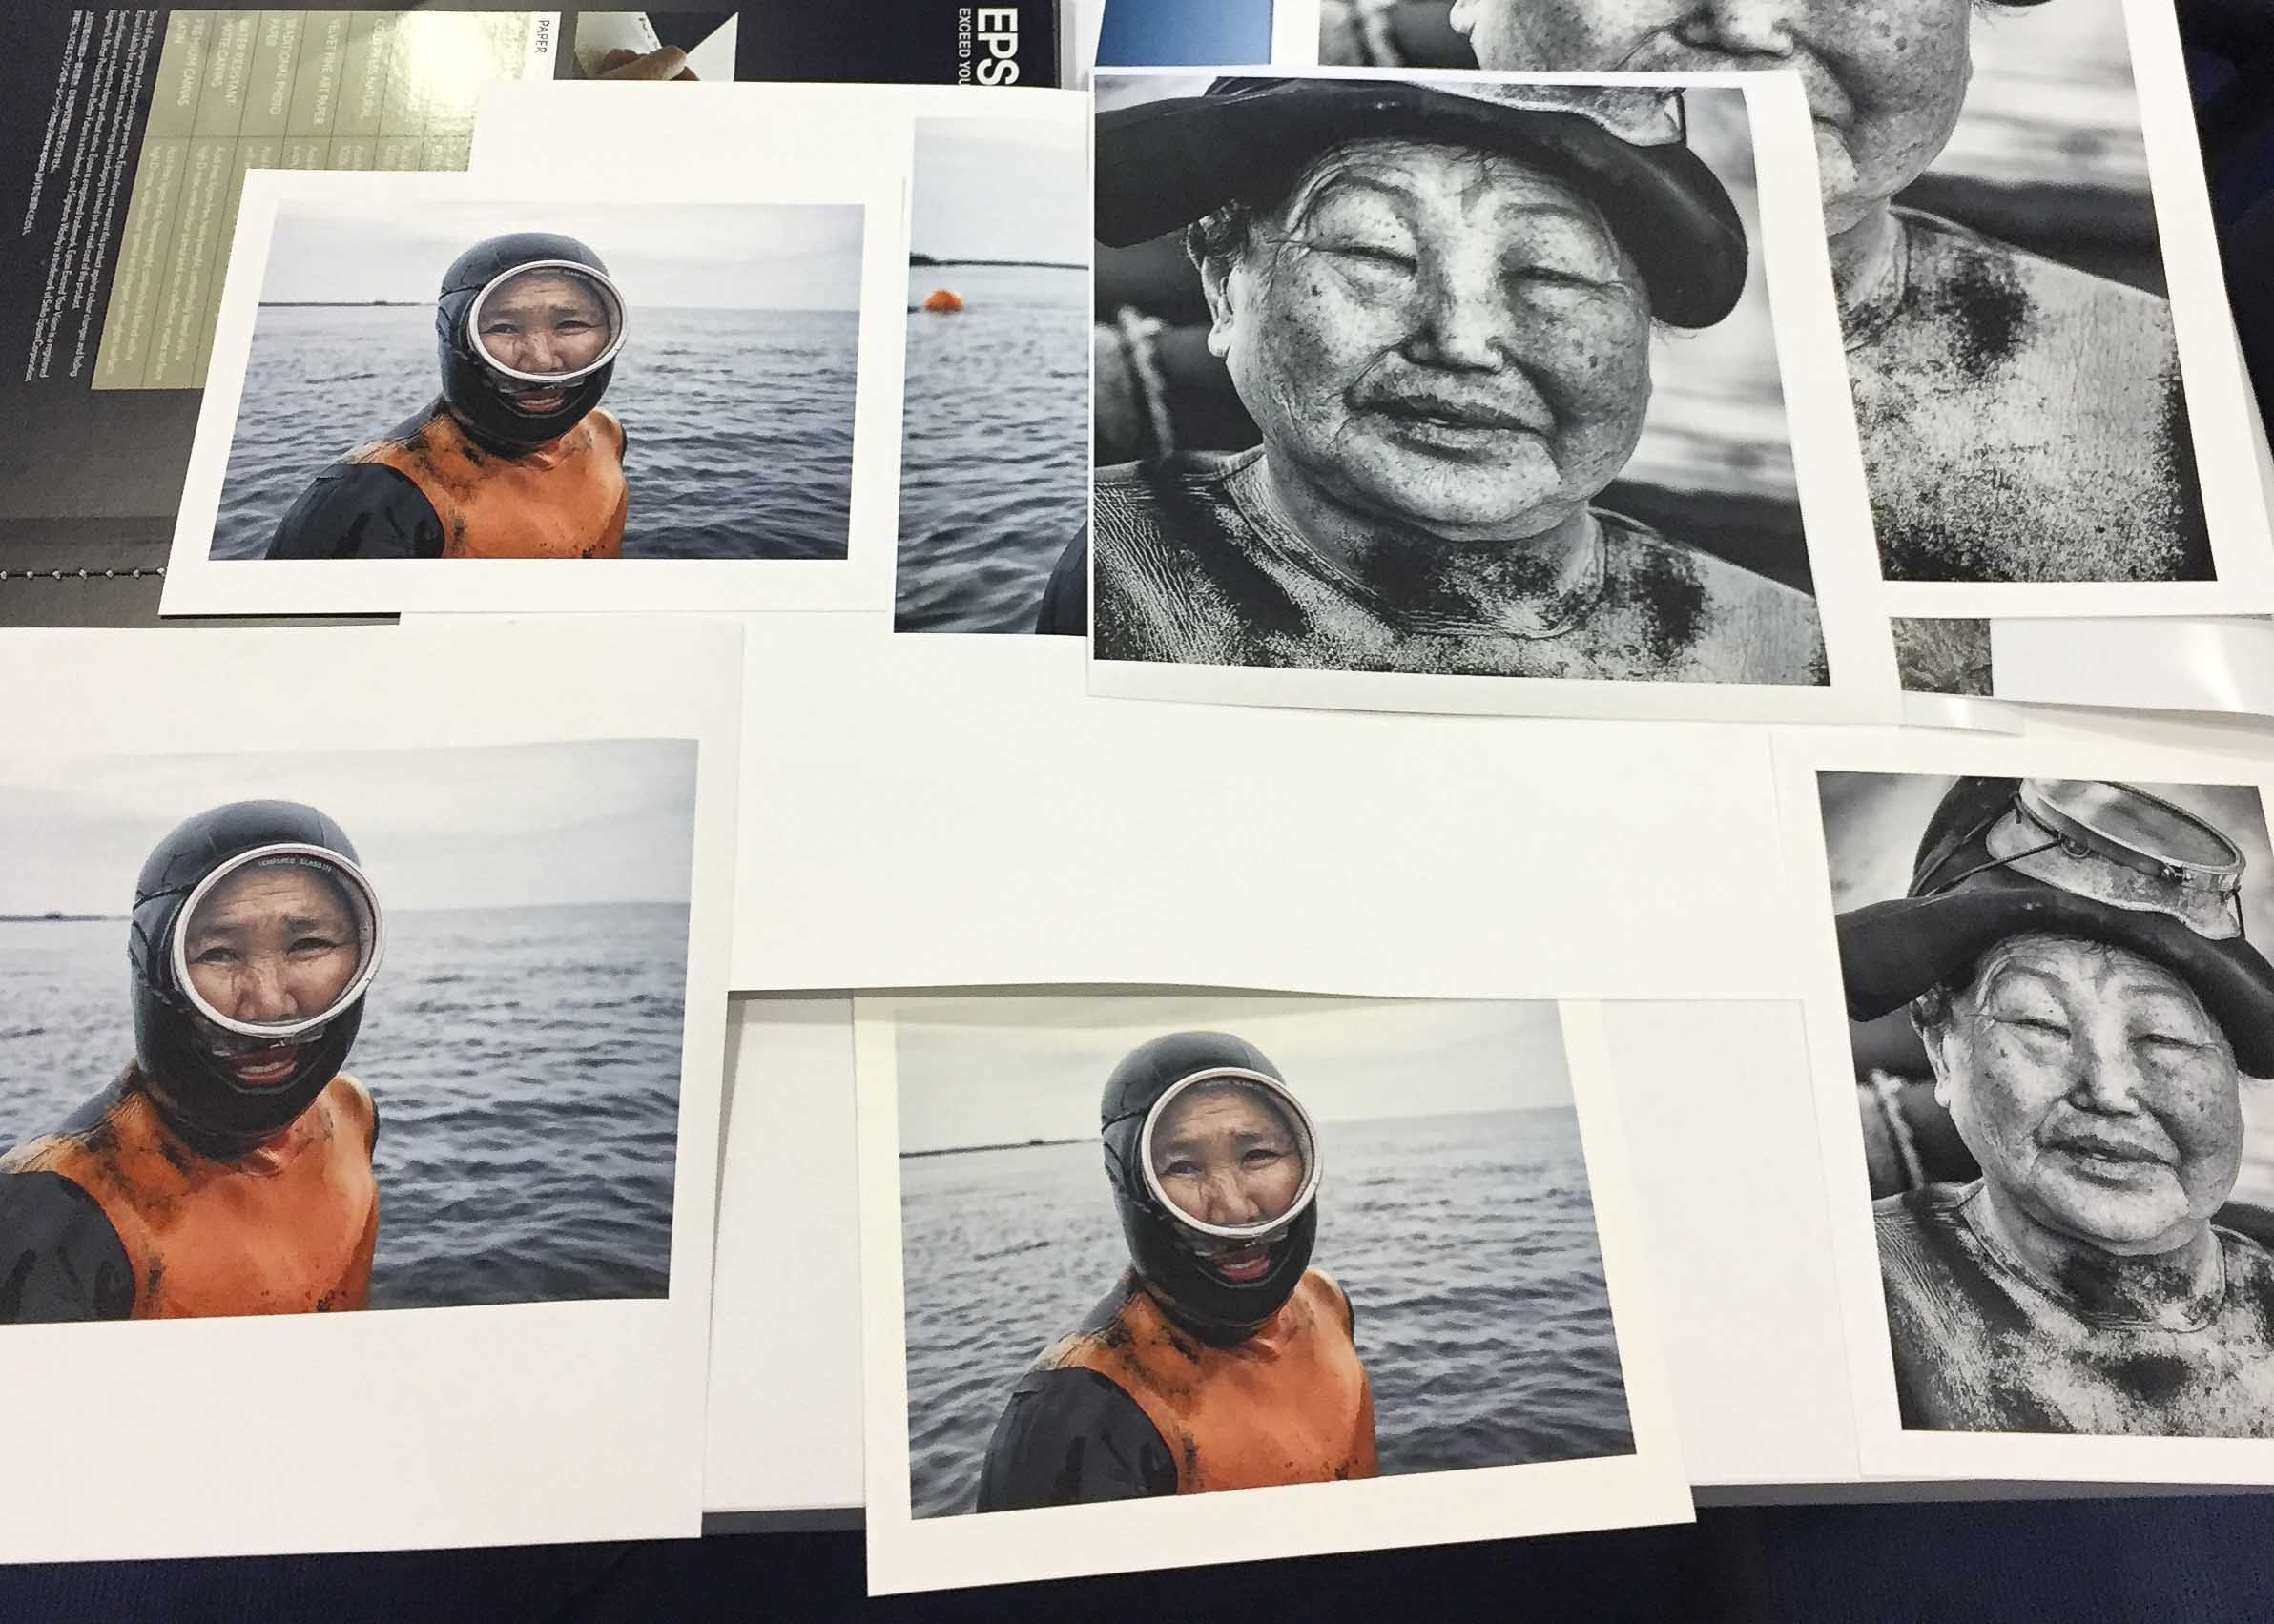 Epson printer fine art jose jeuland photography